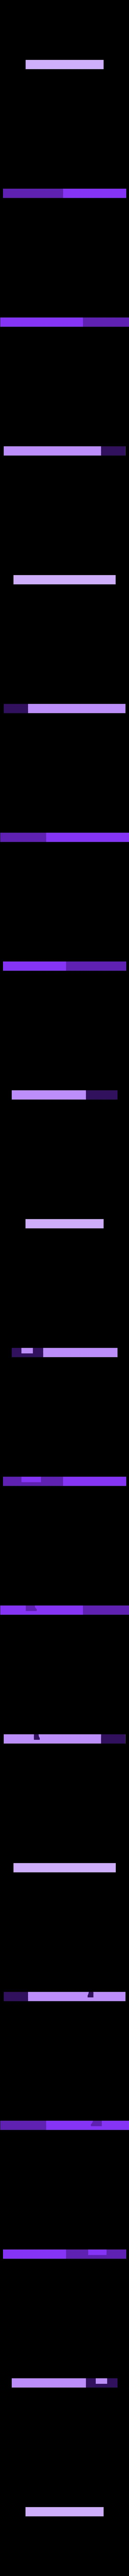 Clasp_1.stl Download free STL file Jacket Buckle-Clasp • 3D printable design, rabotilnicata